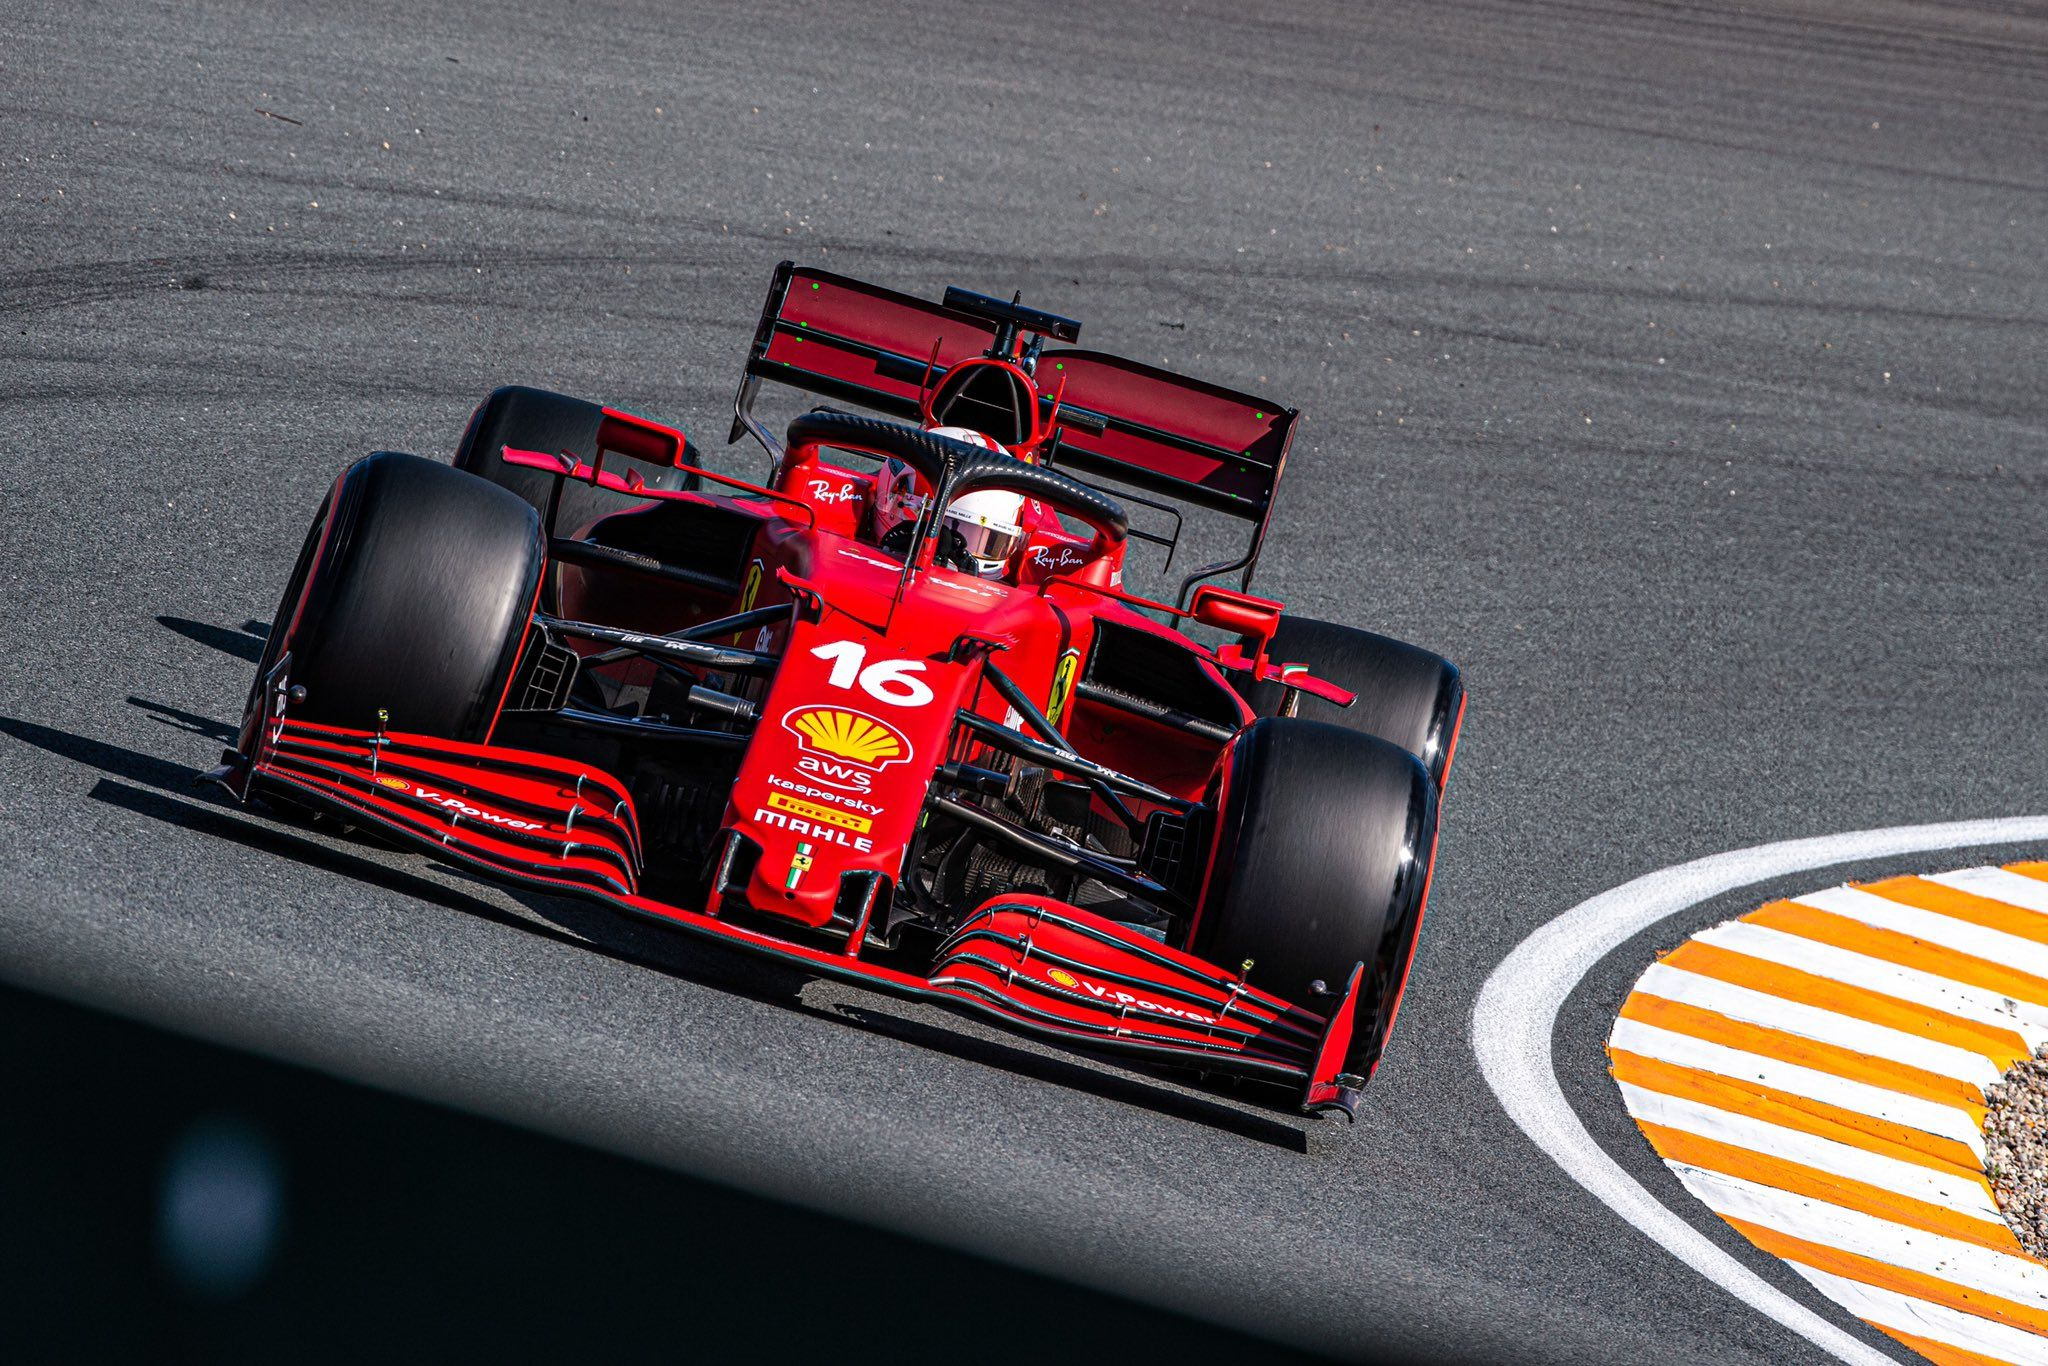 F1, Dutch GP, Charles Leclerc